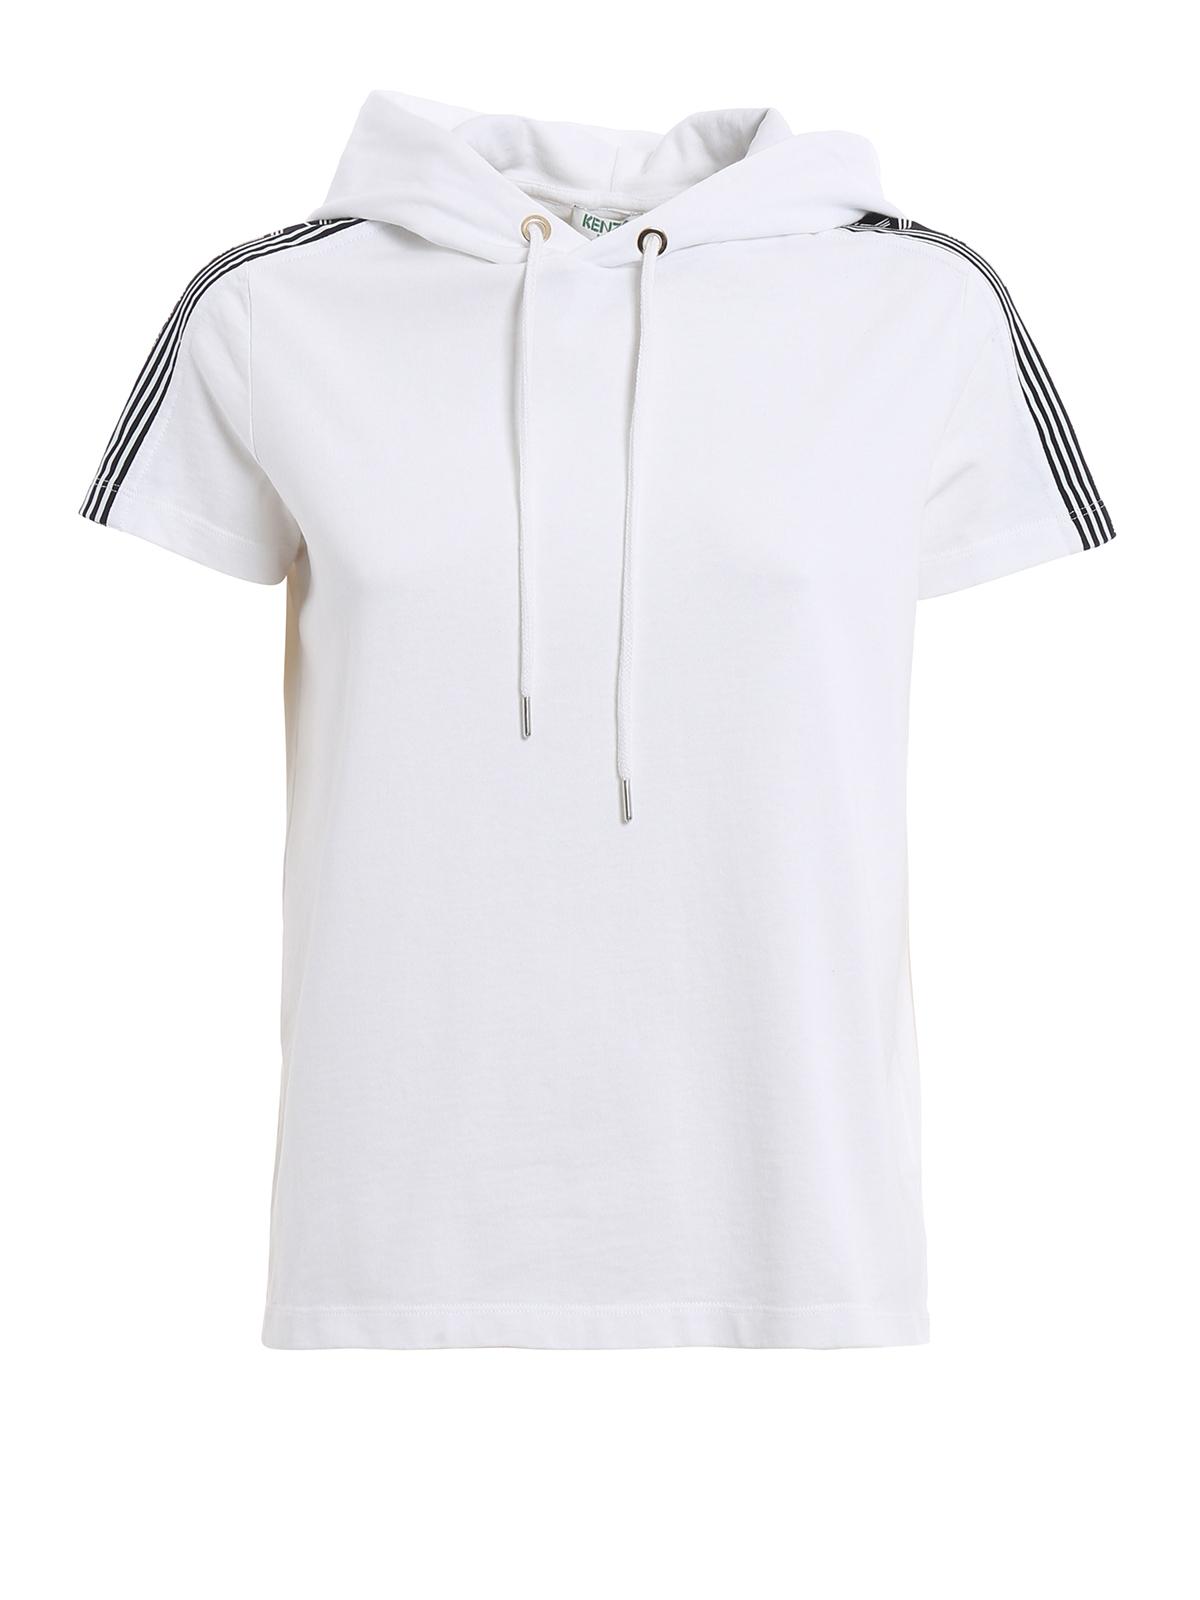 Hooded logo print t shirt by kenzo t shirts ikrix for Logo printed t shirts